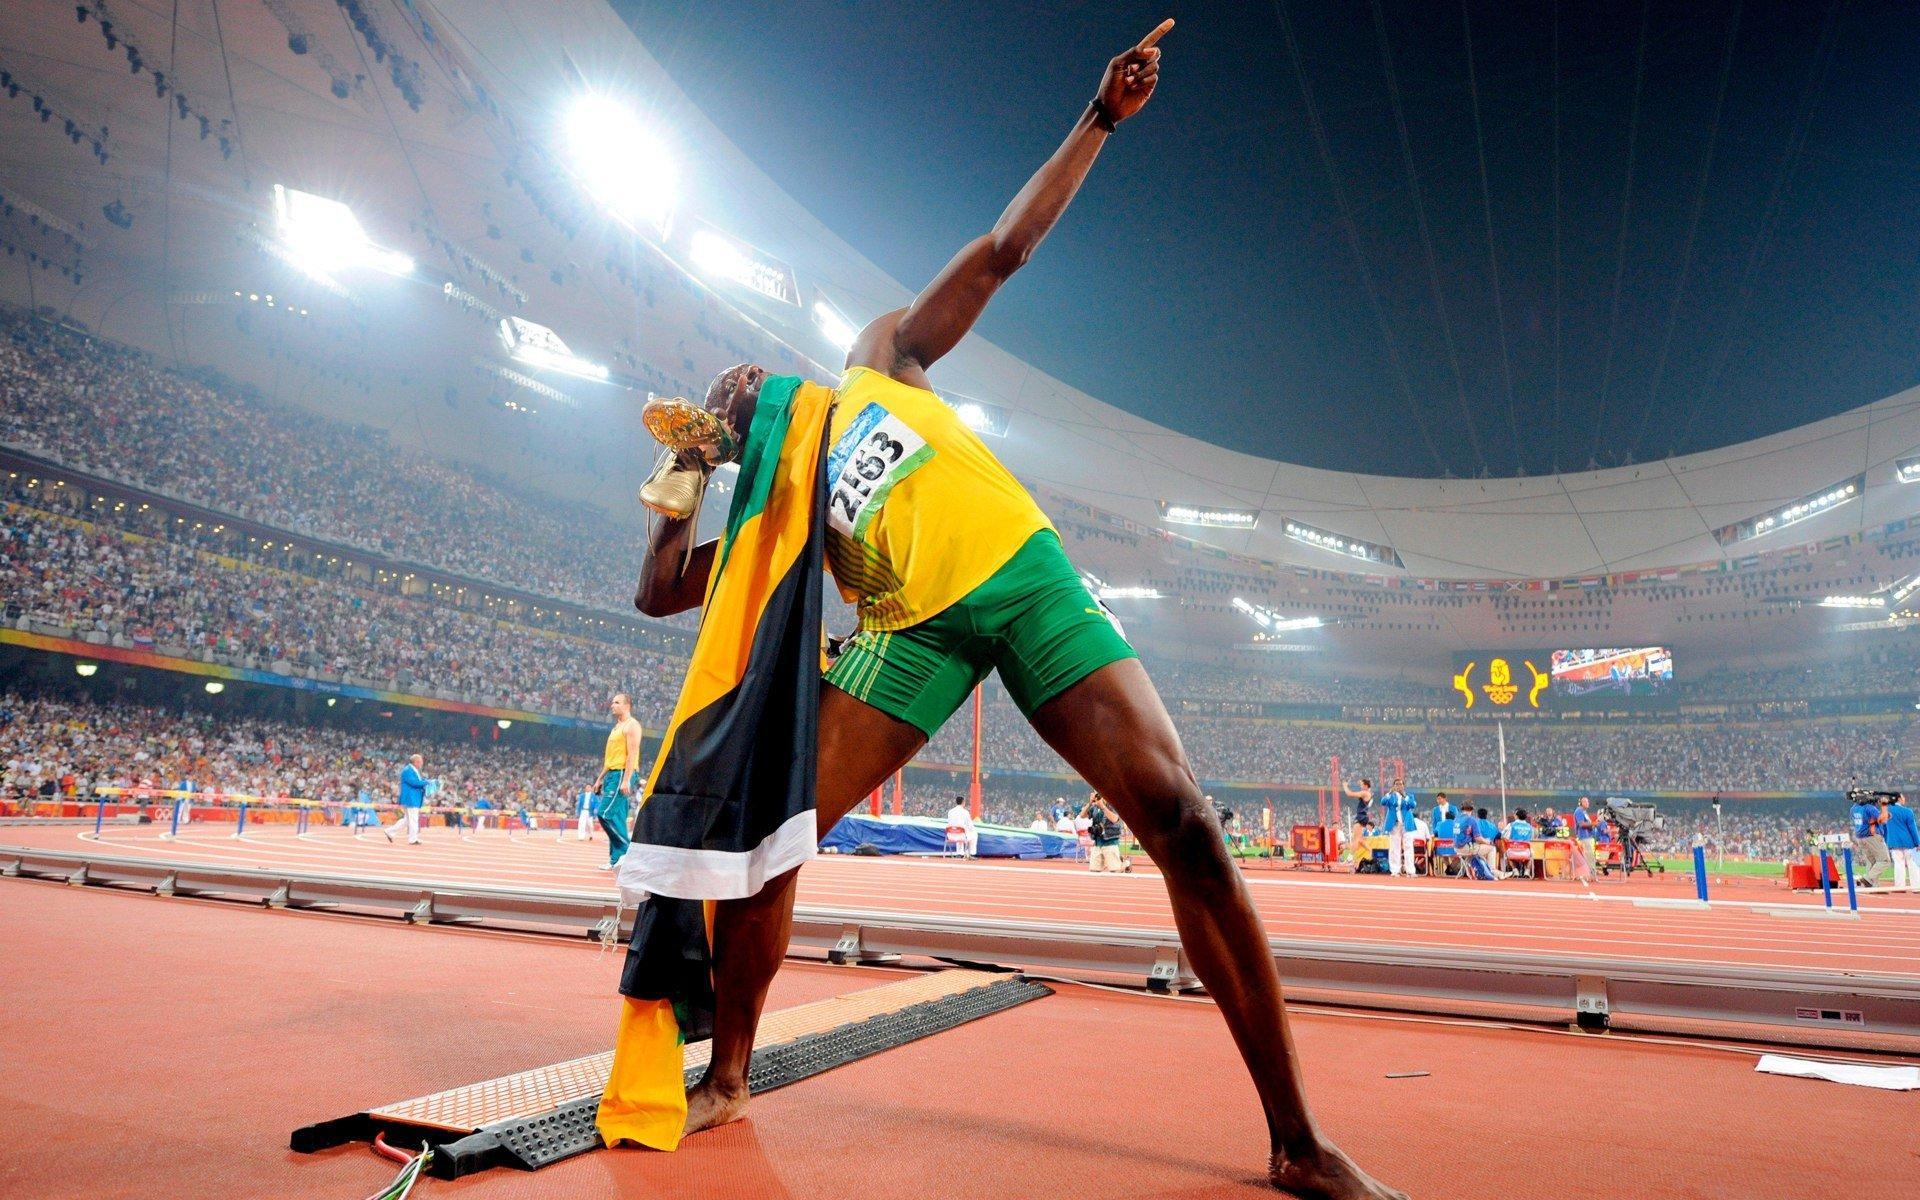 Deporte - Usain Bolt  - Lj Handfield Fondo de Pantalla